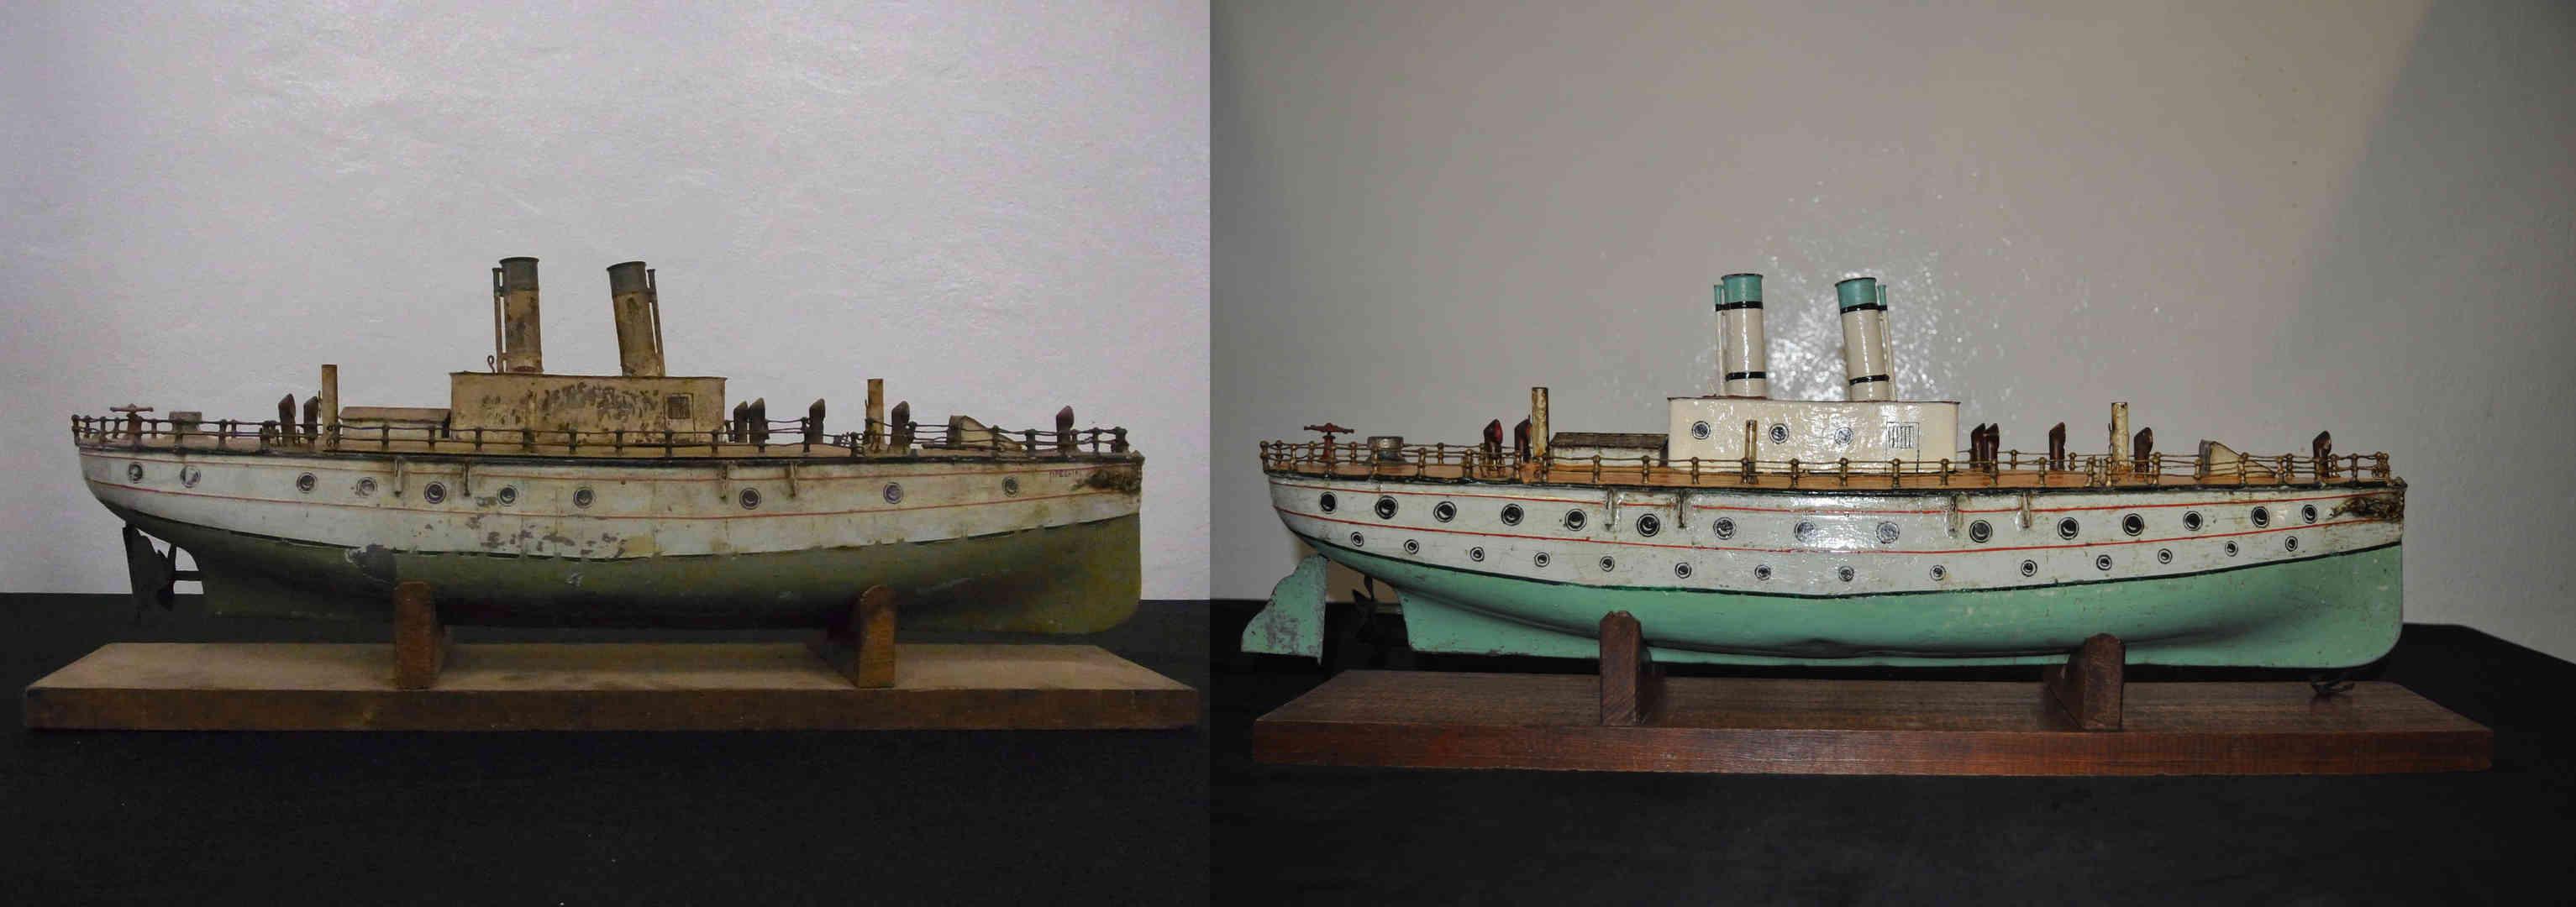 Metal boat conservation